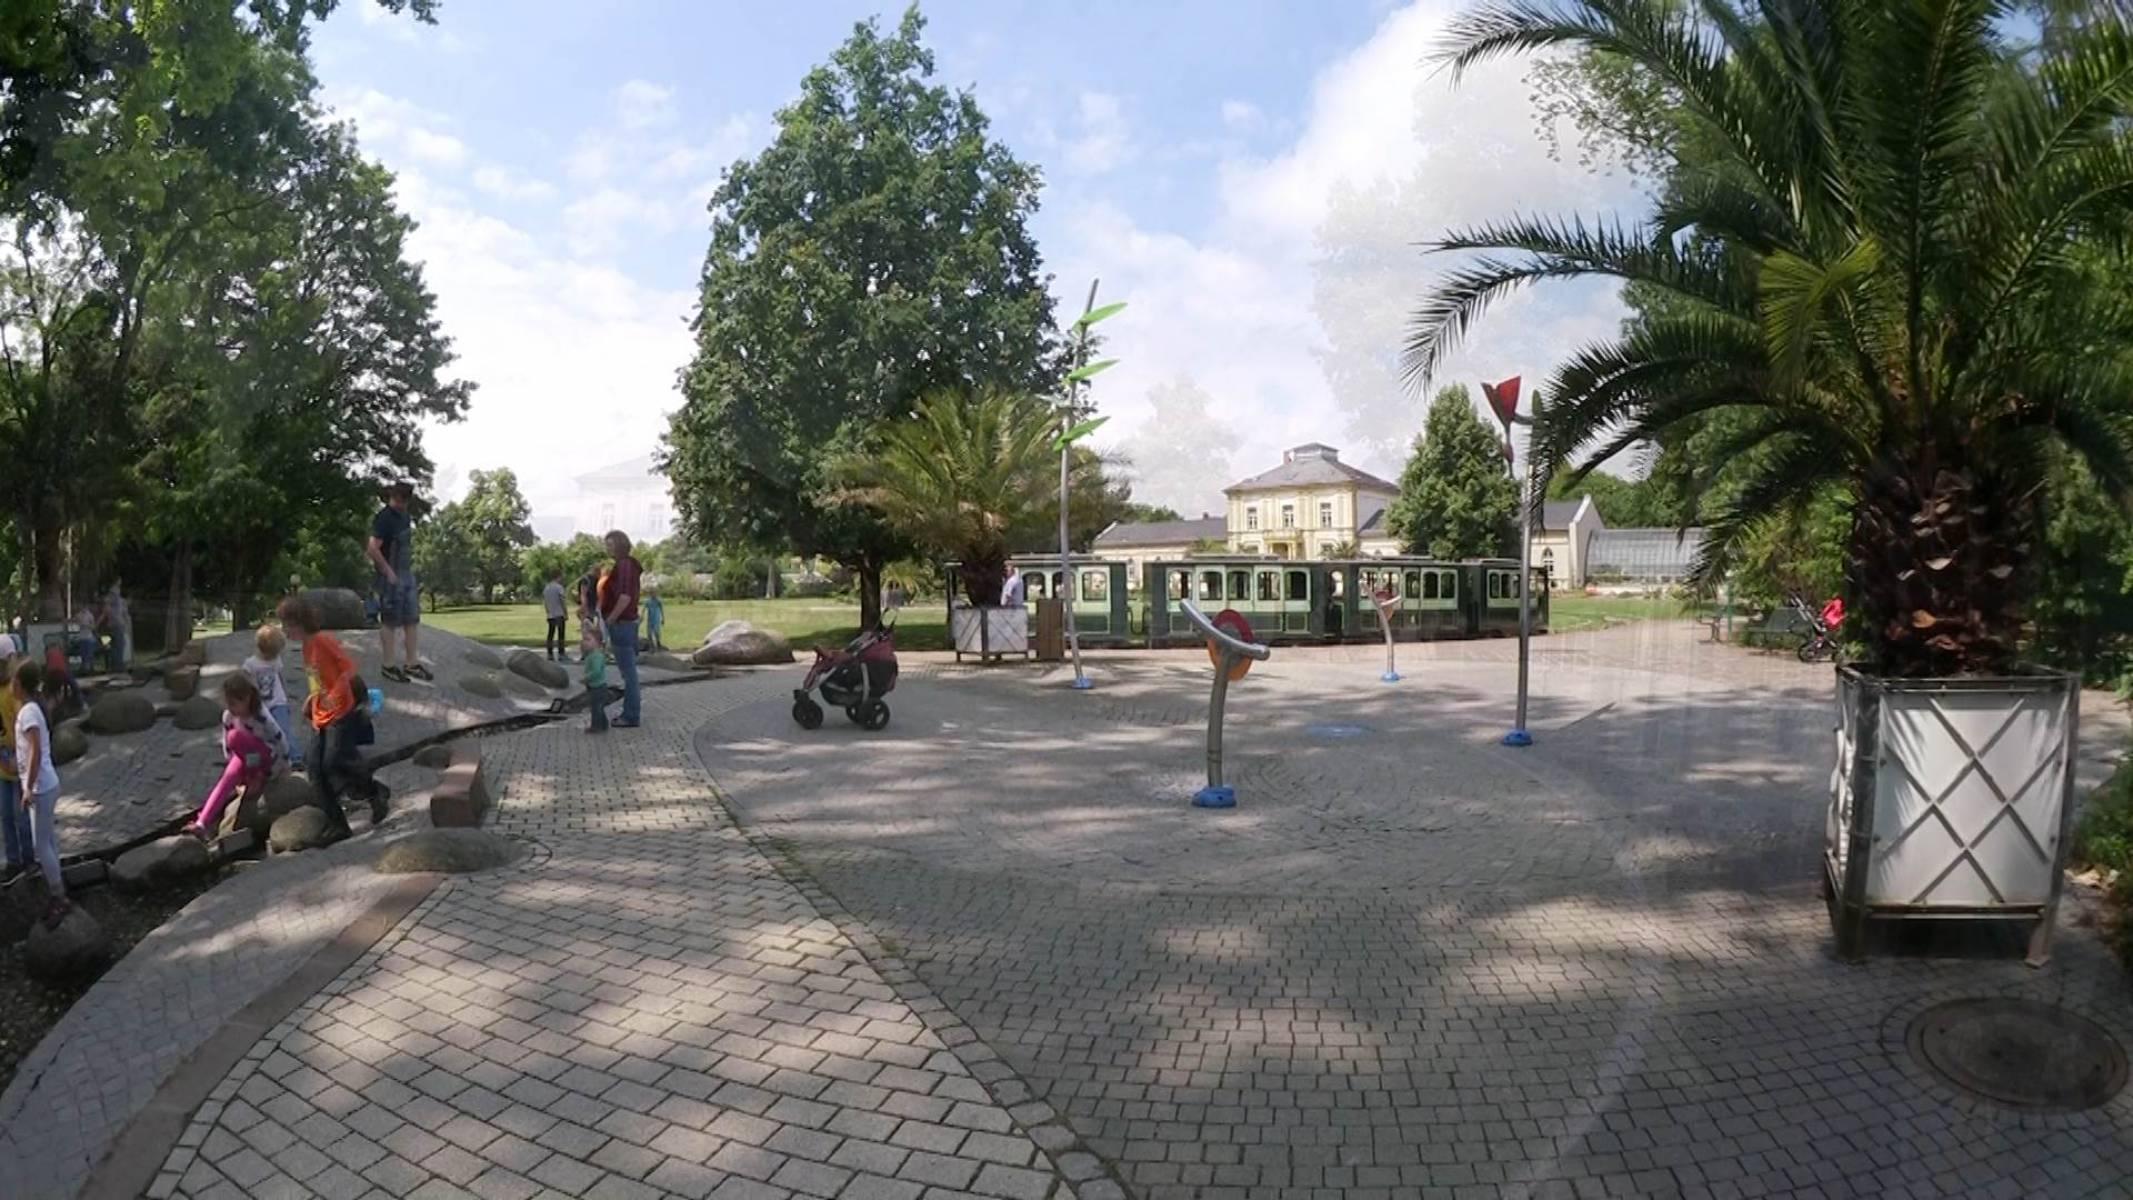 spielplatz palmengarten in frankfurt am main westend nord. Black Bedroom Furniture Sets. Home Design Ideas